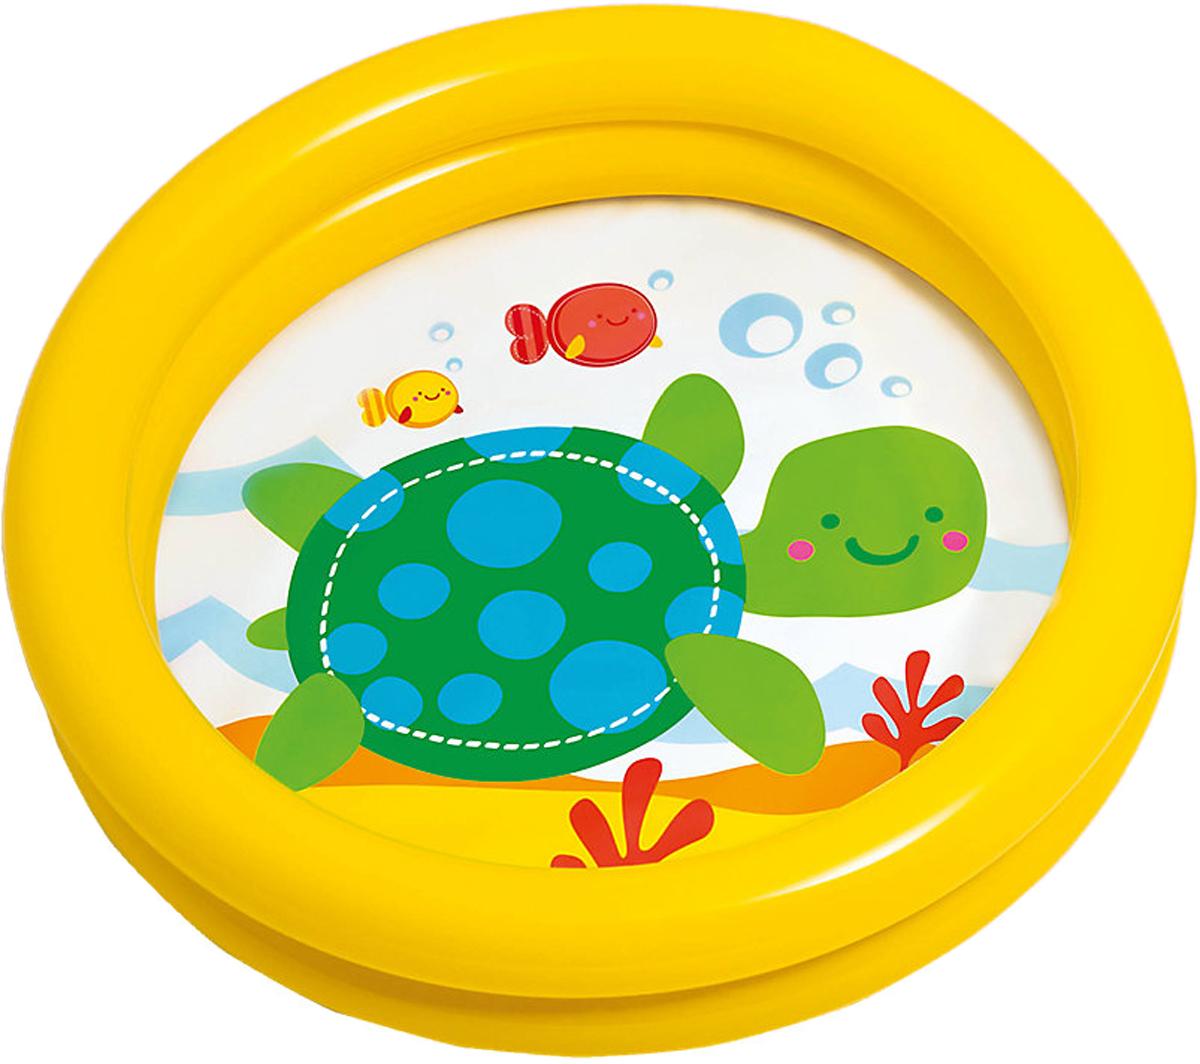 Надувной бассейн Intex Мини, цвет: желтый, 61 х 15 см, 1-3 годас59409_жёлтыйНадувной бассейн Intex Мини, цвет: желтый, 61 х 15 см, 1-3 года